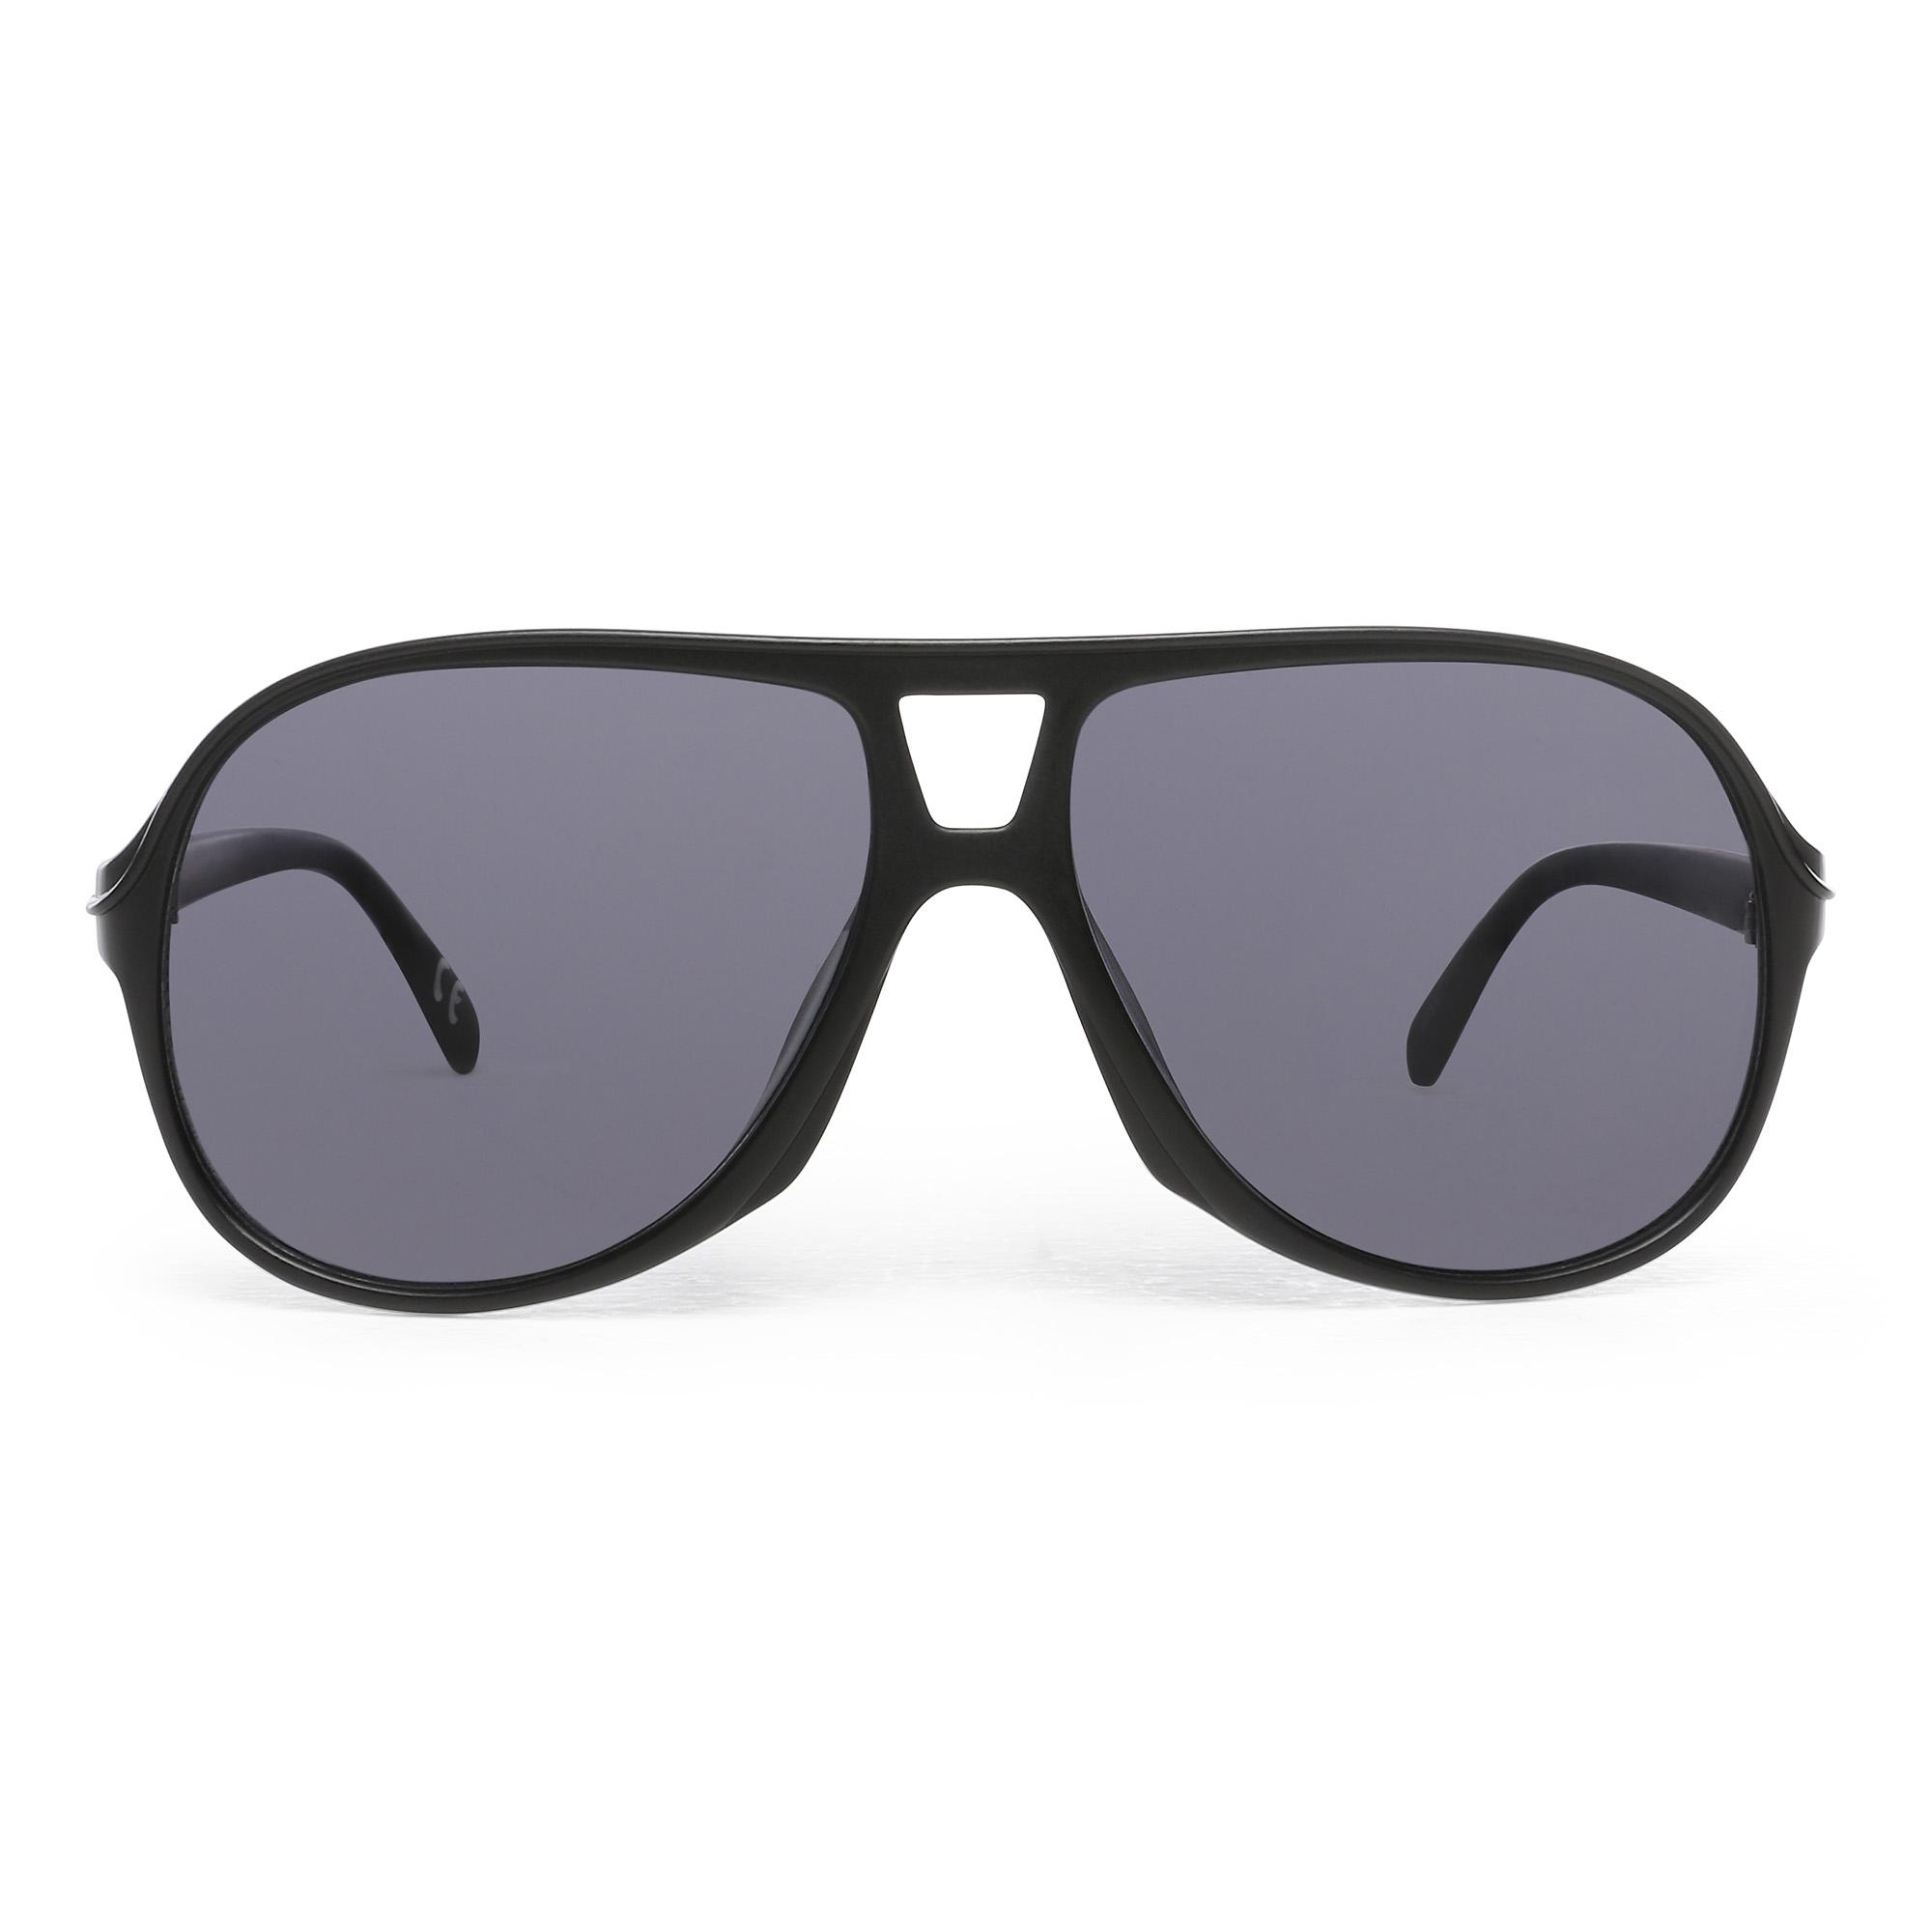 Солнцезащитные очки Seek Shades VANS цвет none